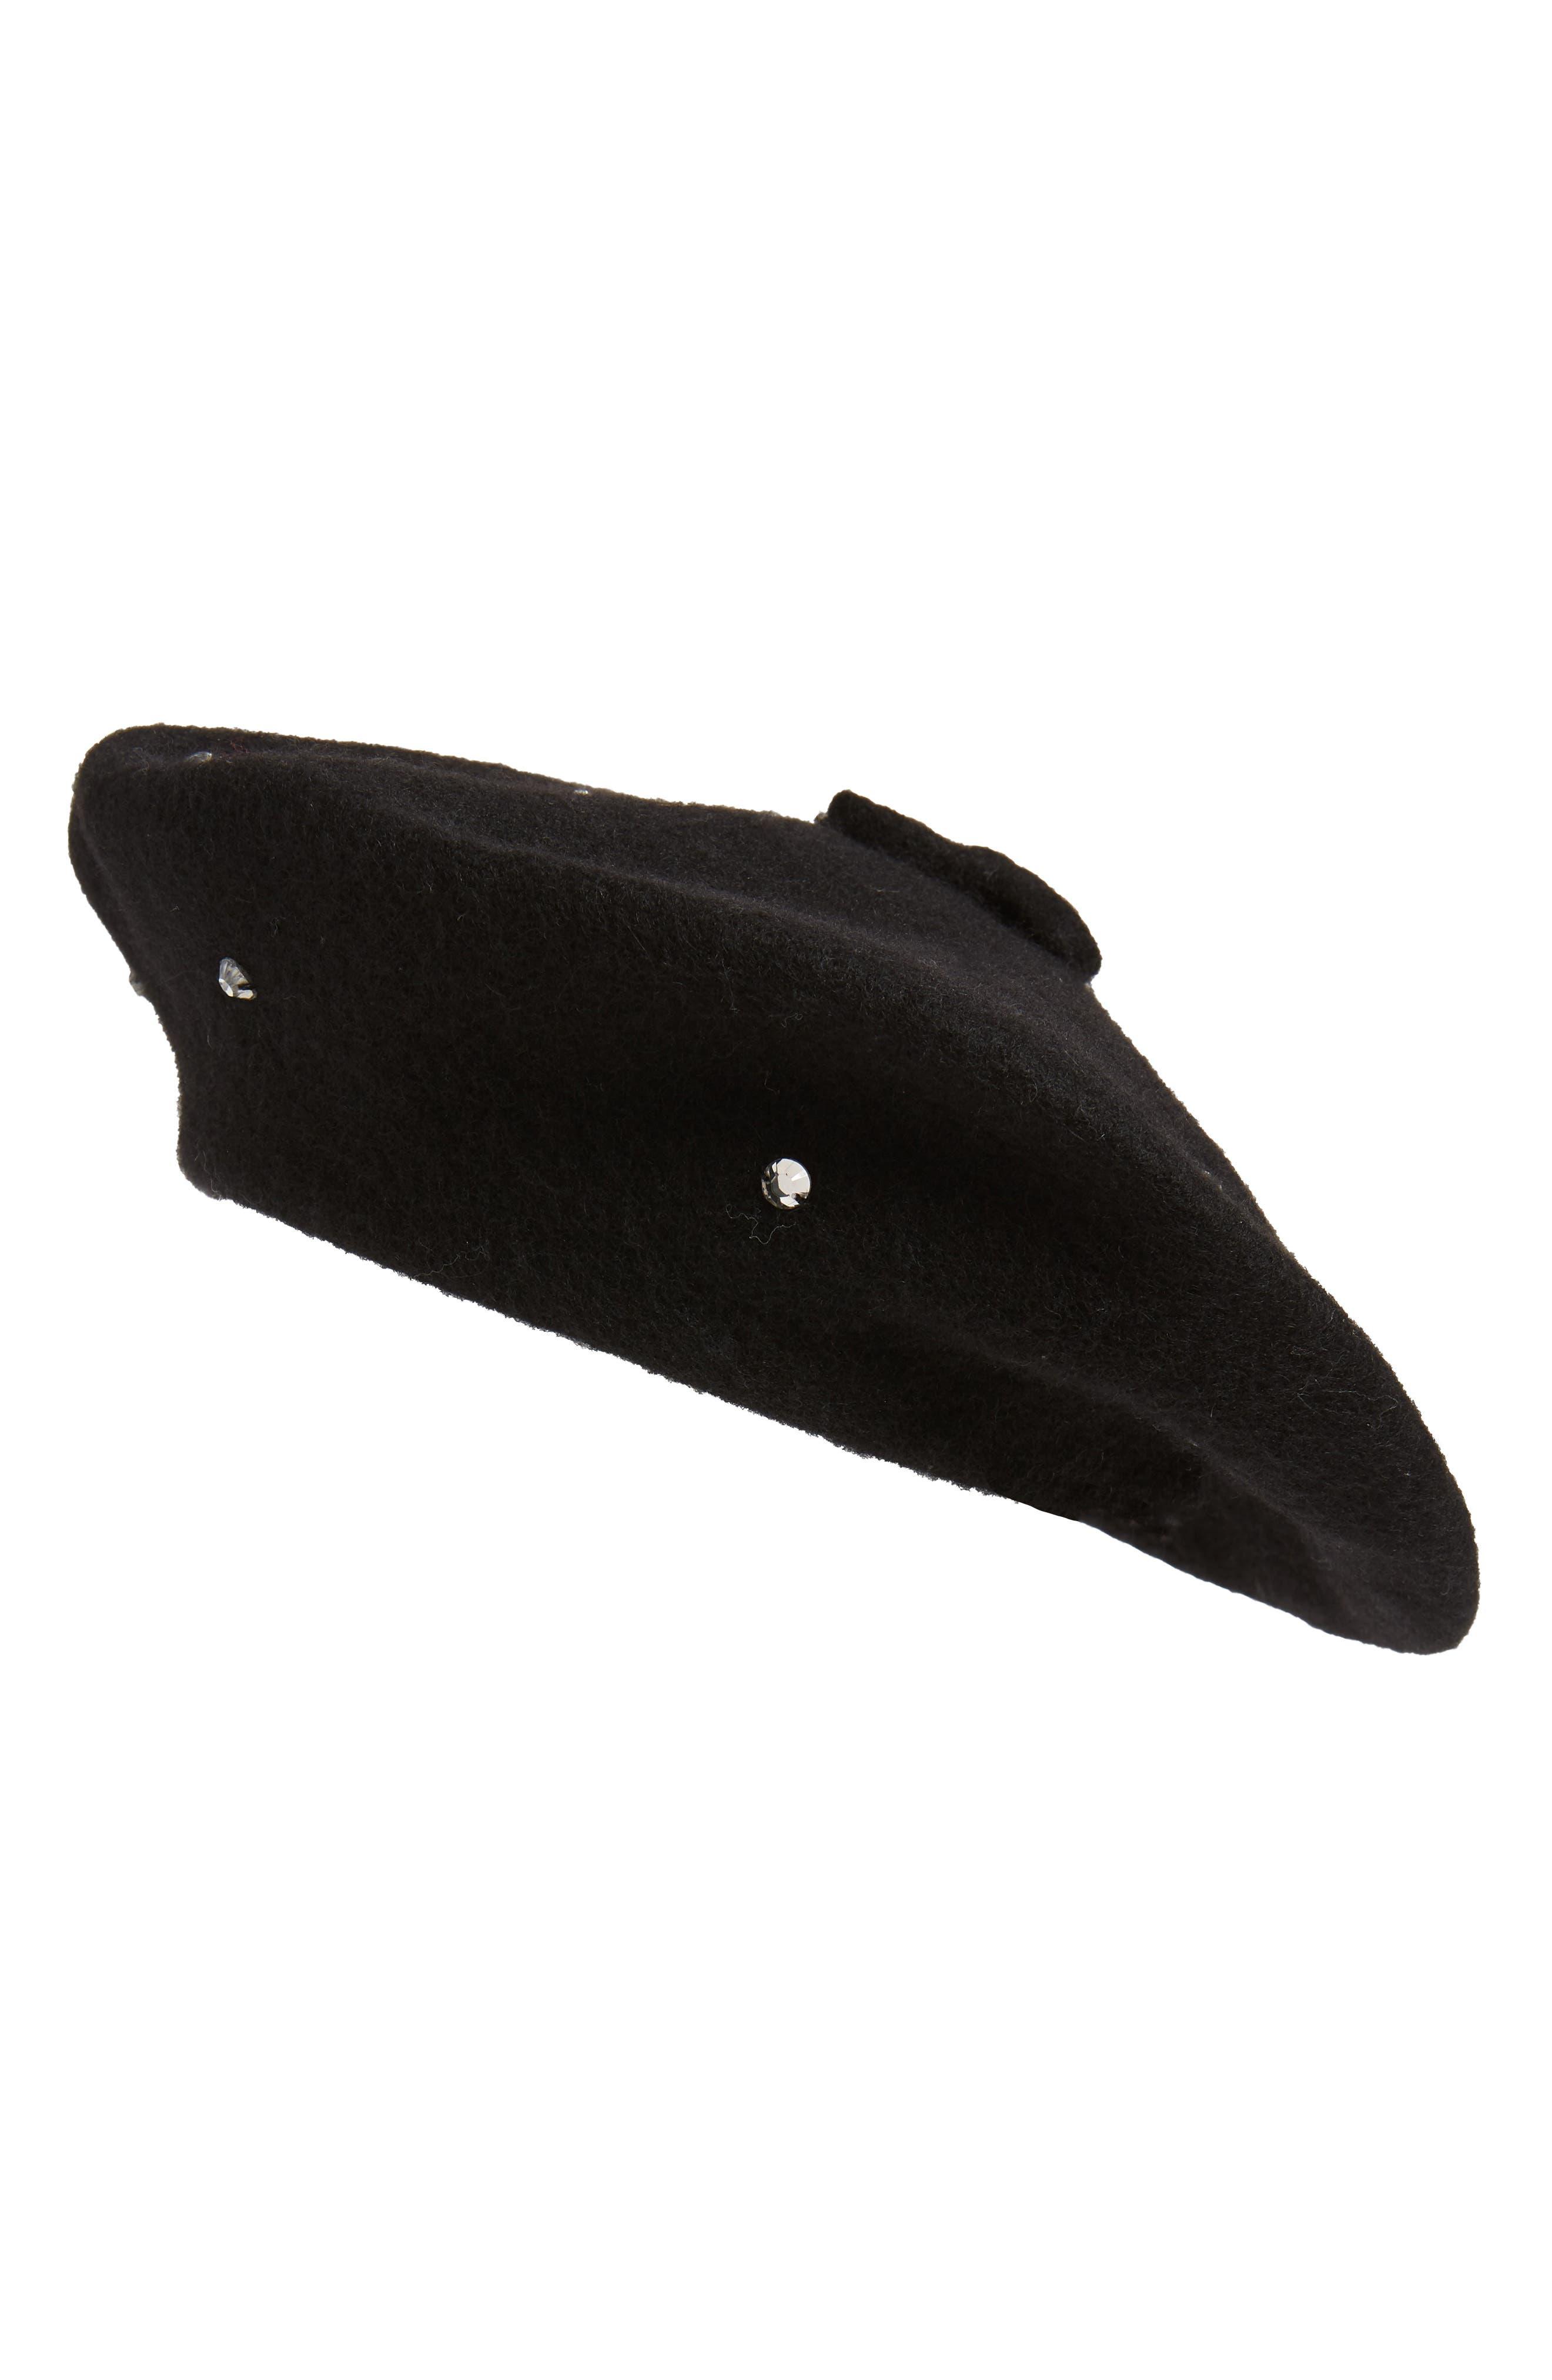 KATE SPADE NEW YORK,                             bedazzled felt beret,                             Main thumbnail 1, color,                             BLACK/ SMOKE